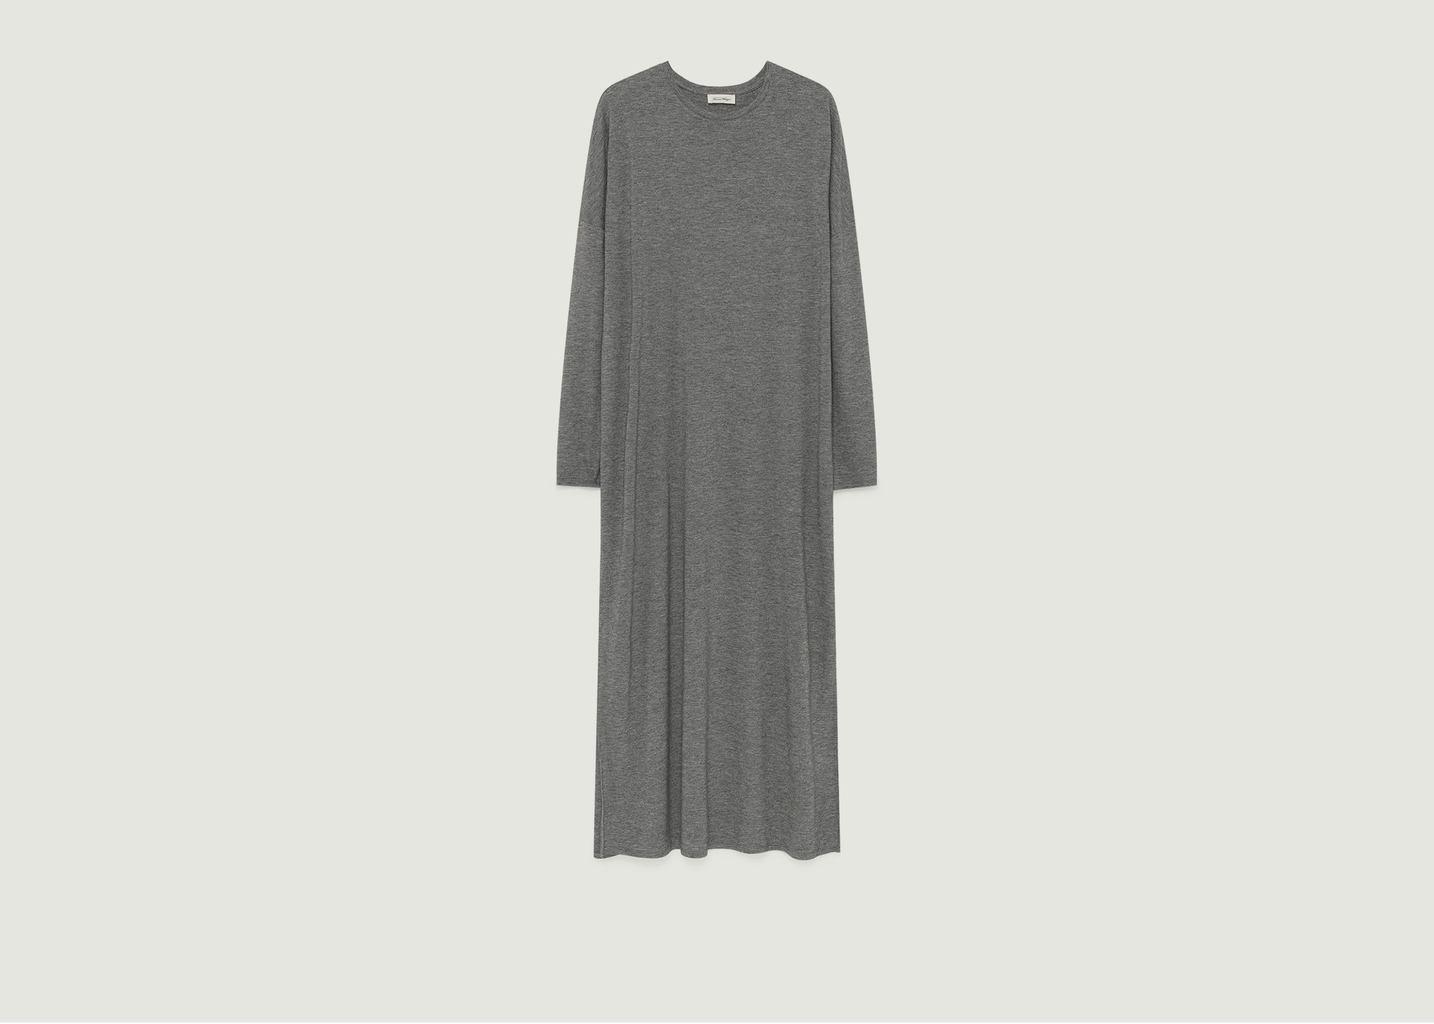 Robe Manches Longues Babiday - American Vintage